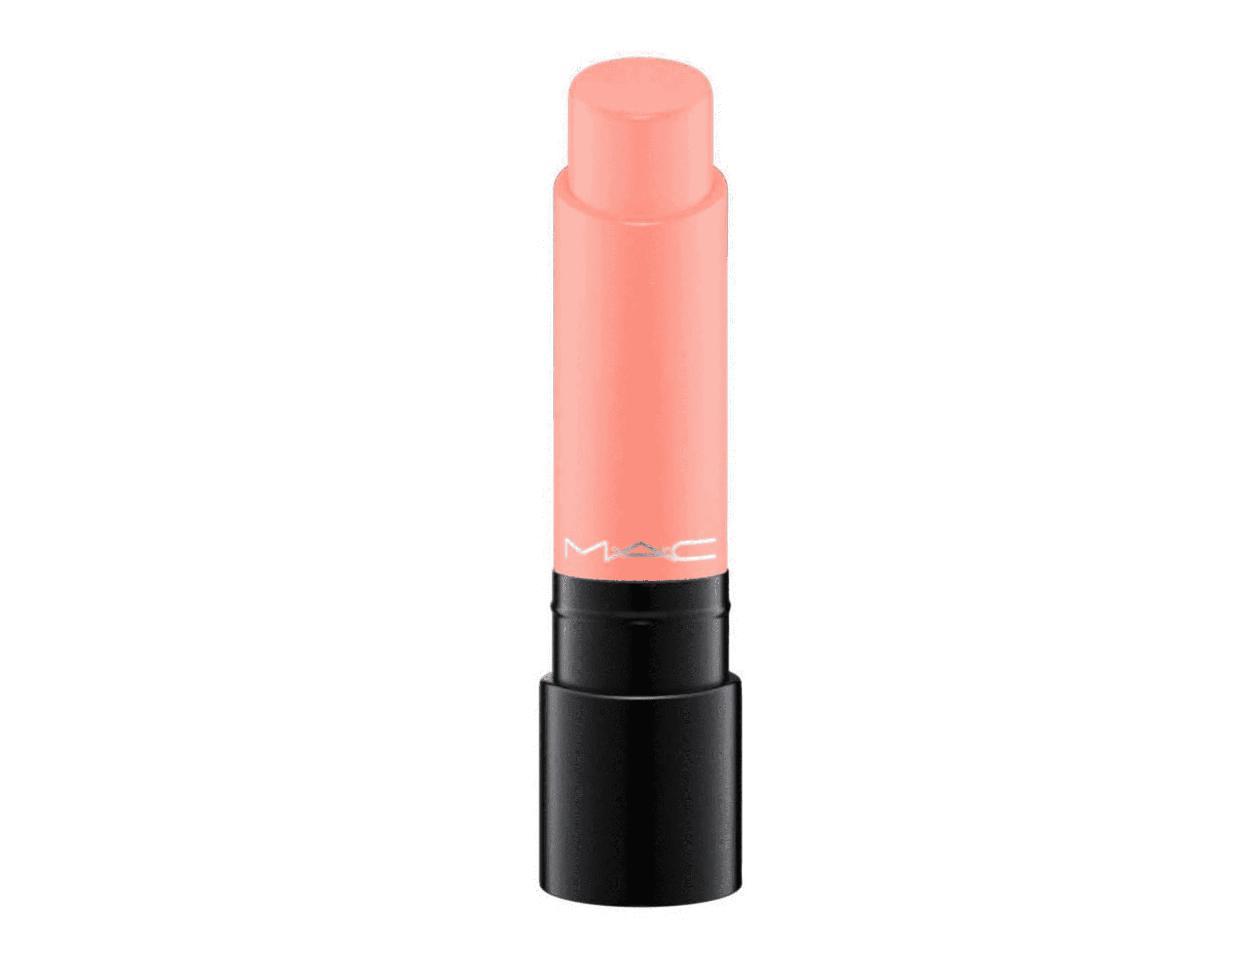 MAC Liptensity Lipstick Bite O' Georgia